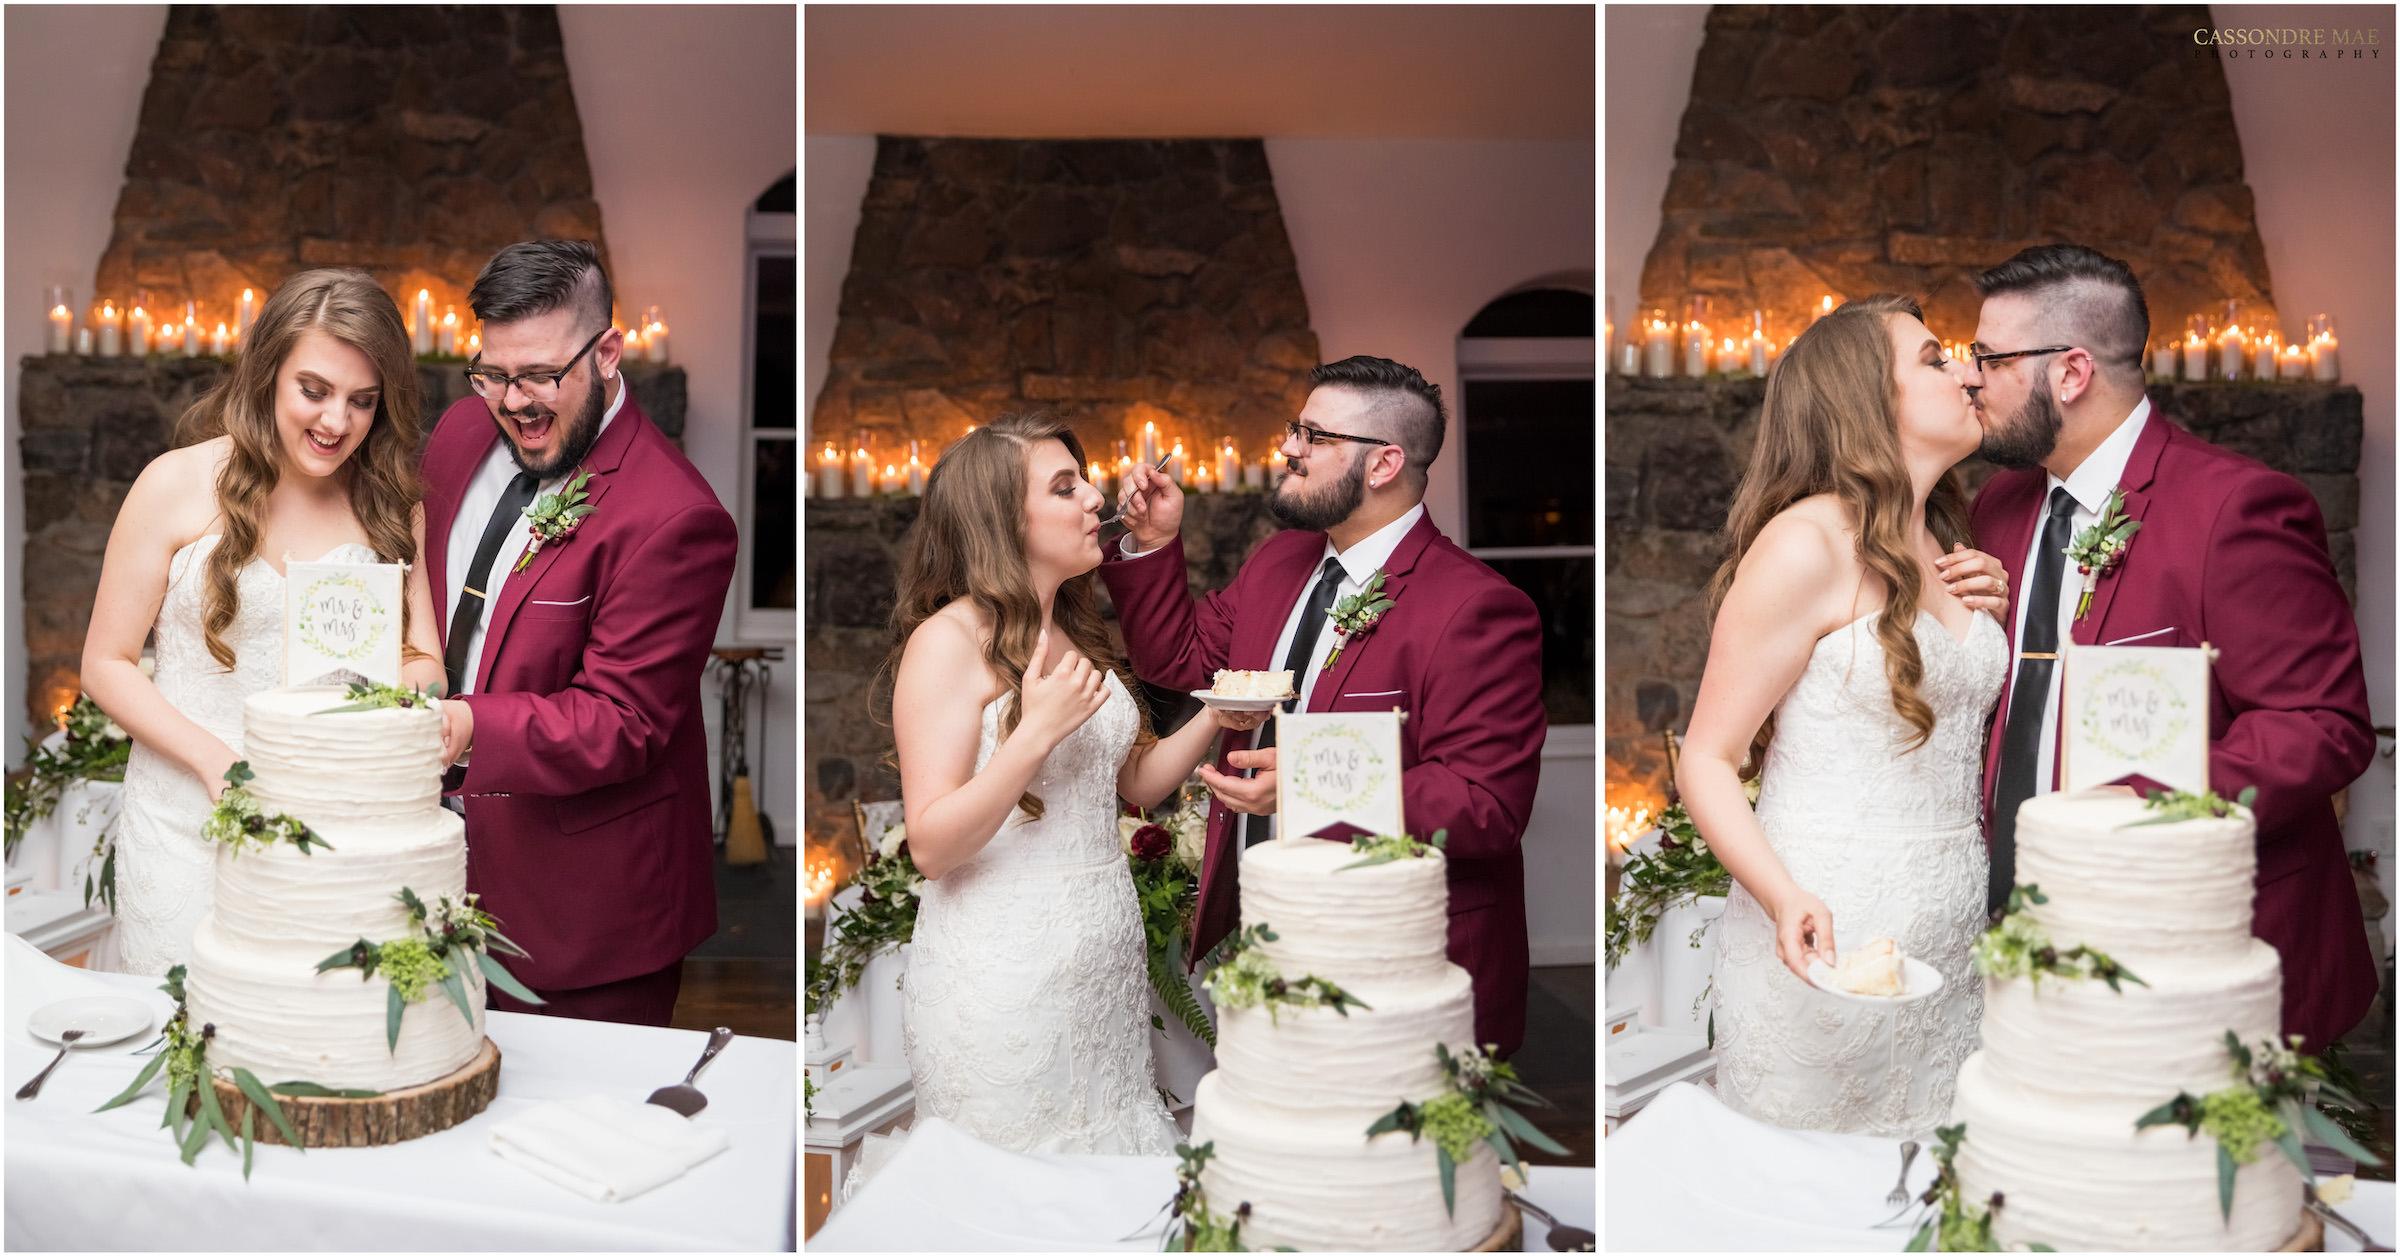 Cassondre Mae Photography Cove Castle Weddings 15.jpg